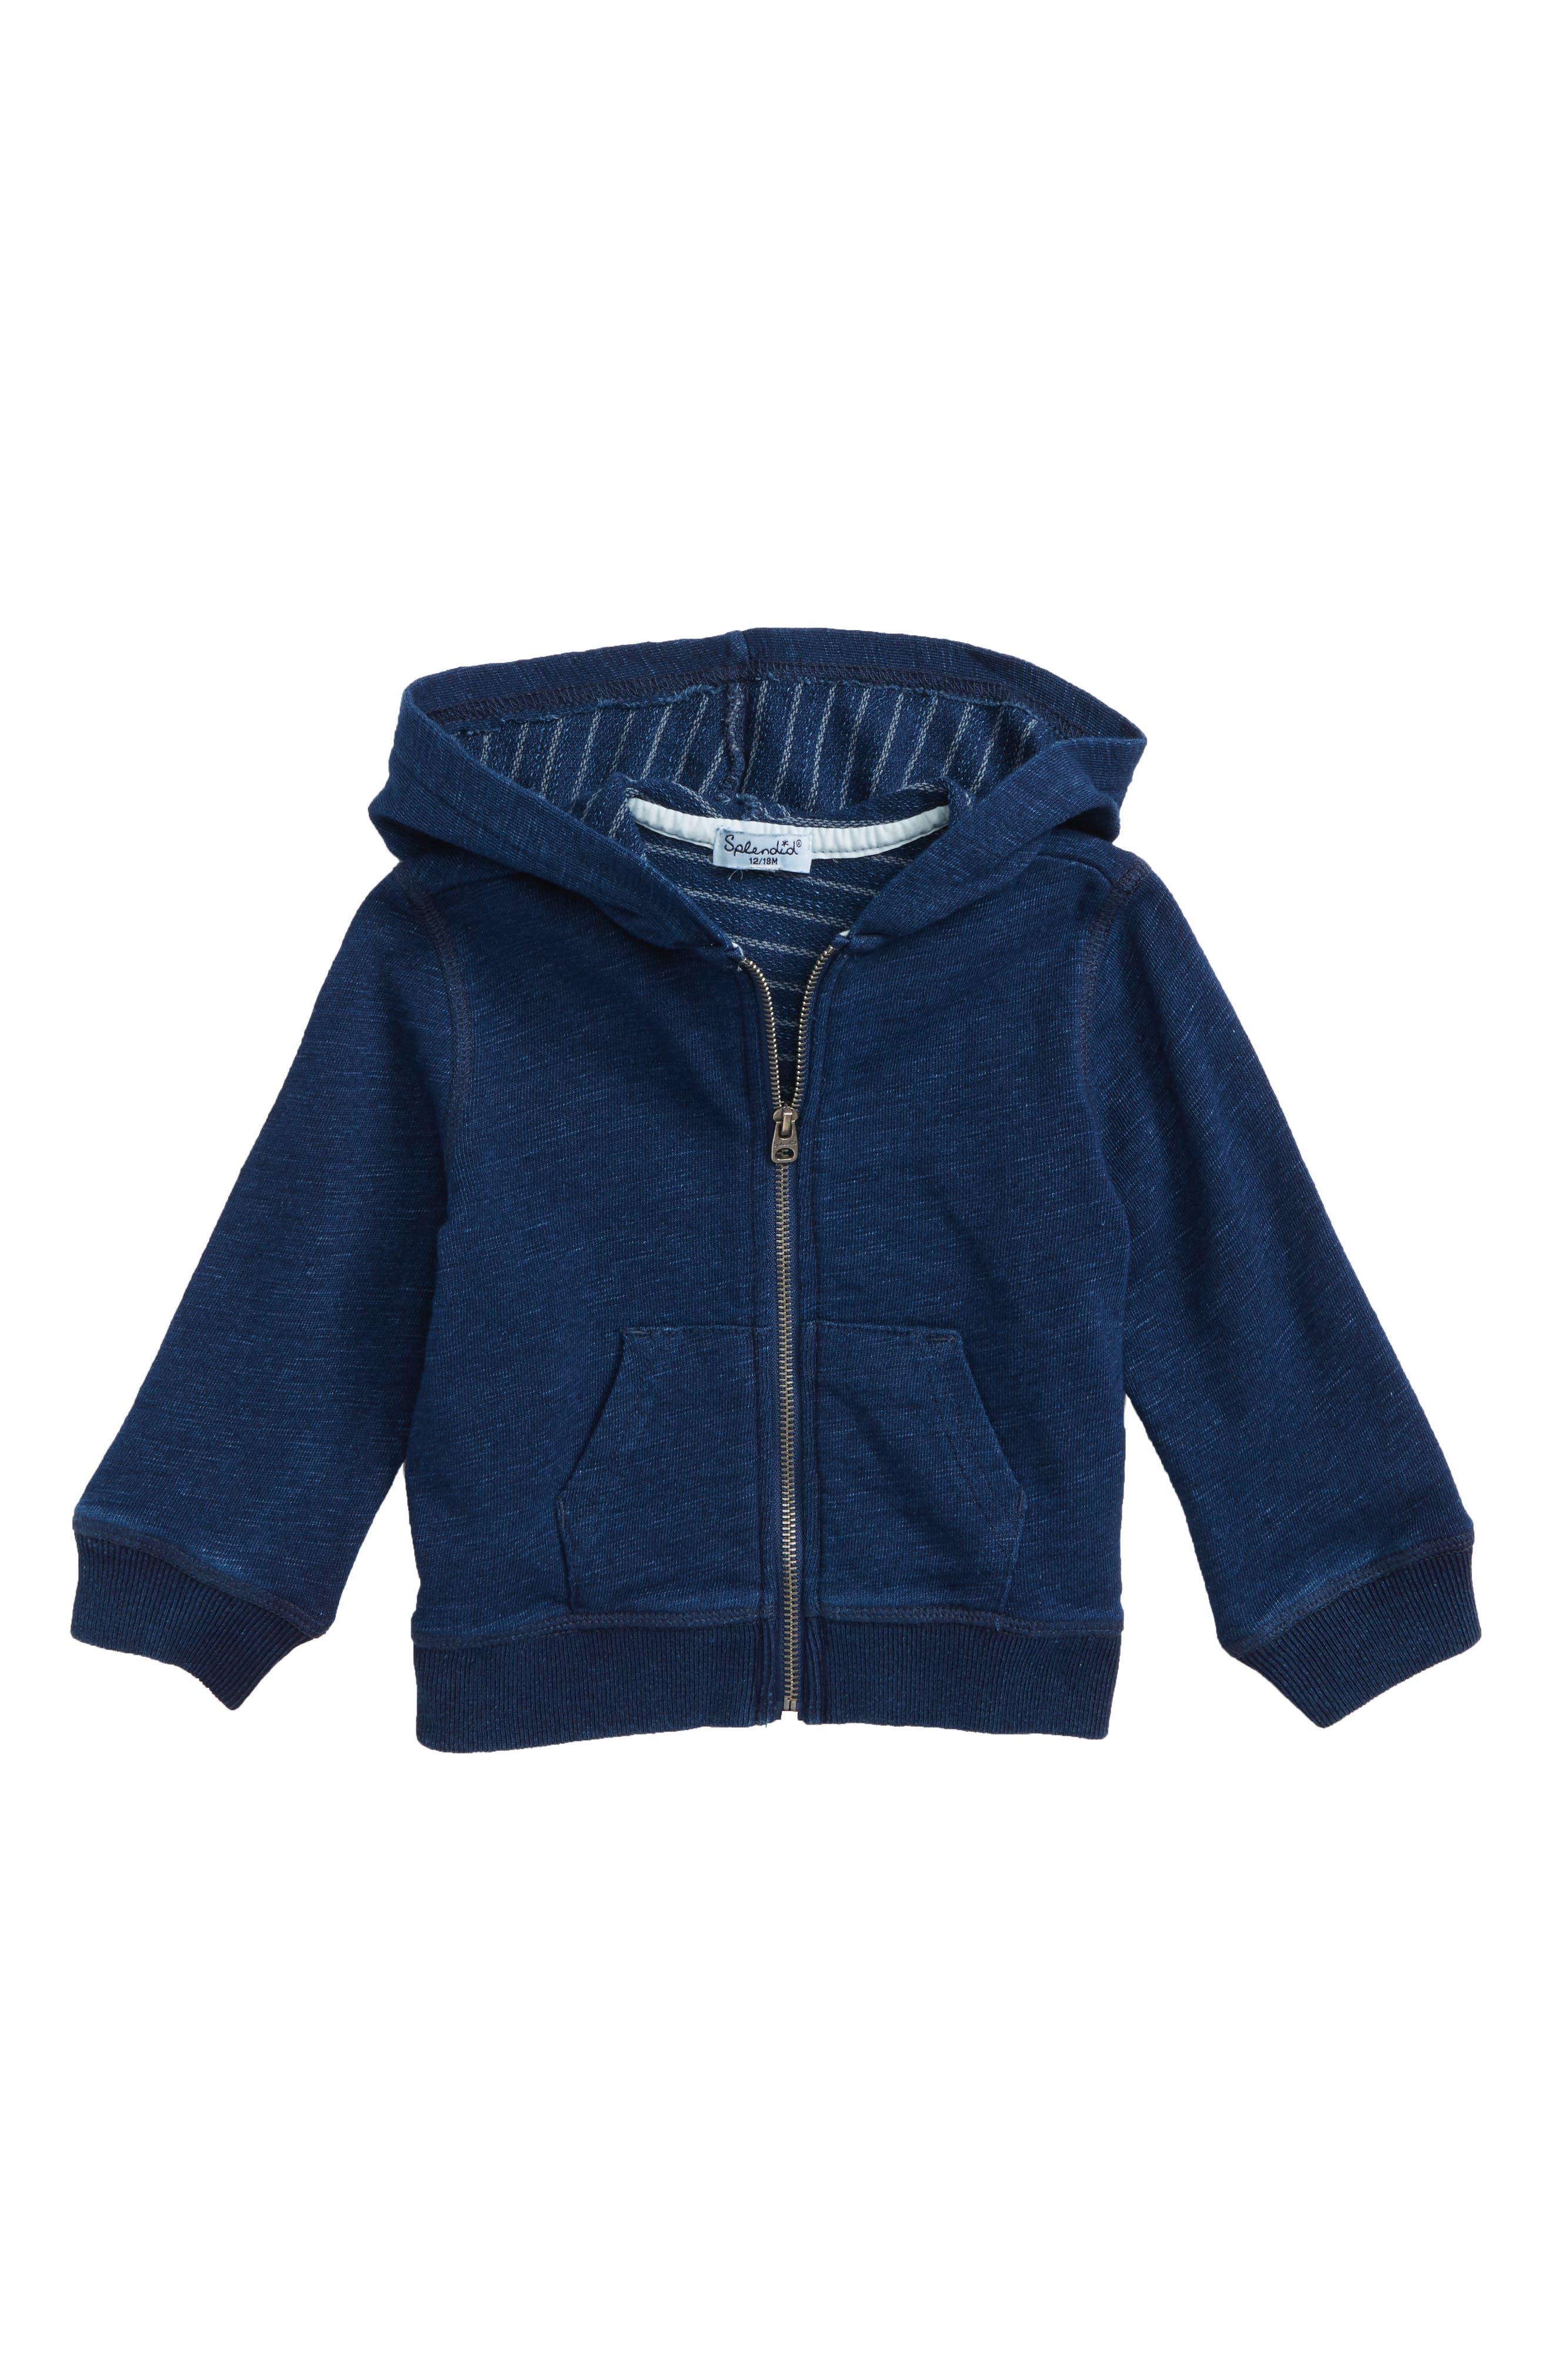 Infant Boys Splendid Double Knit Zip Hoodie Size 36M  Blue